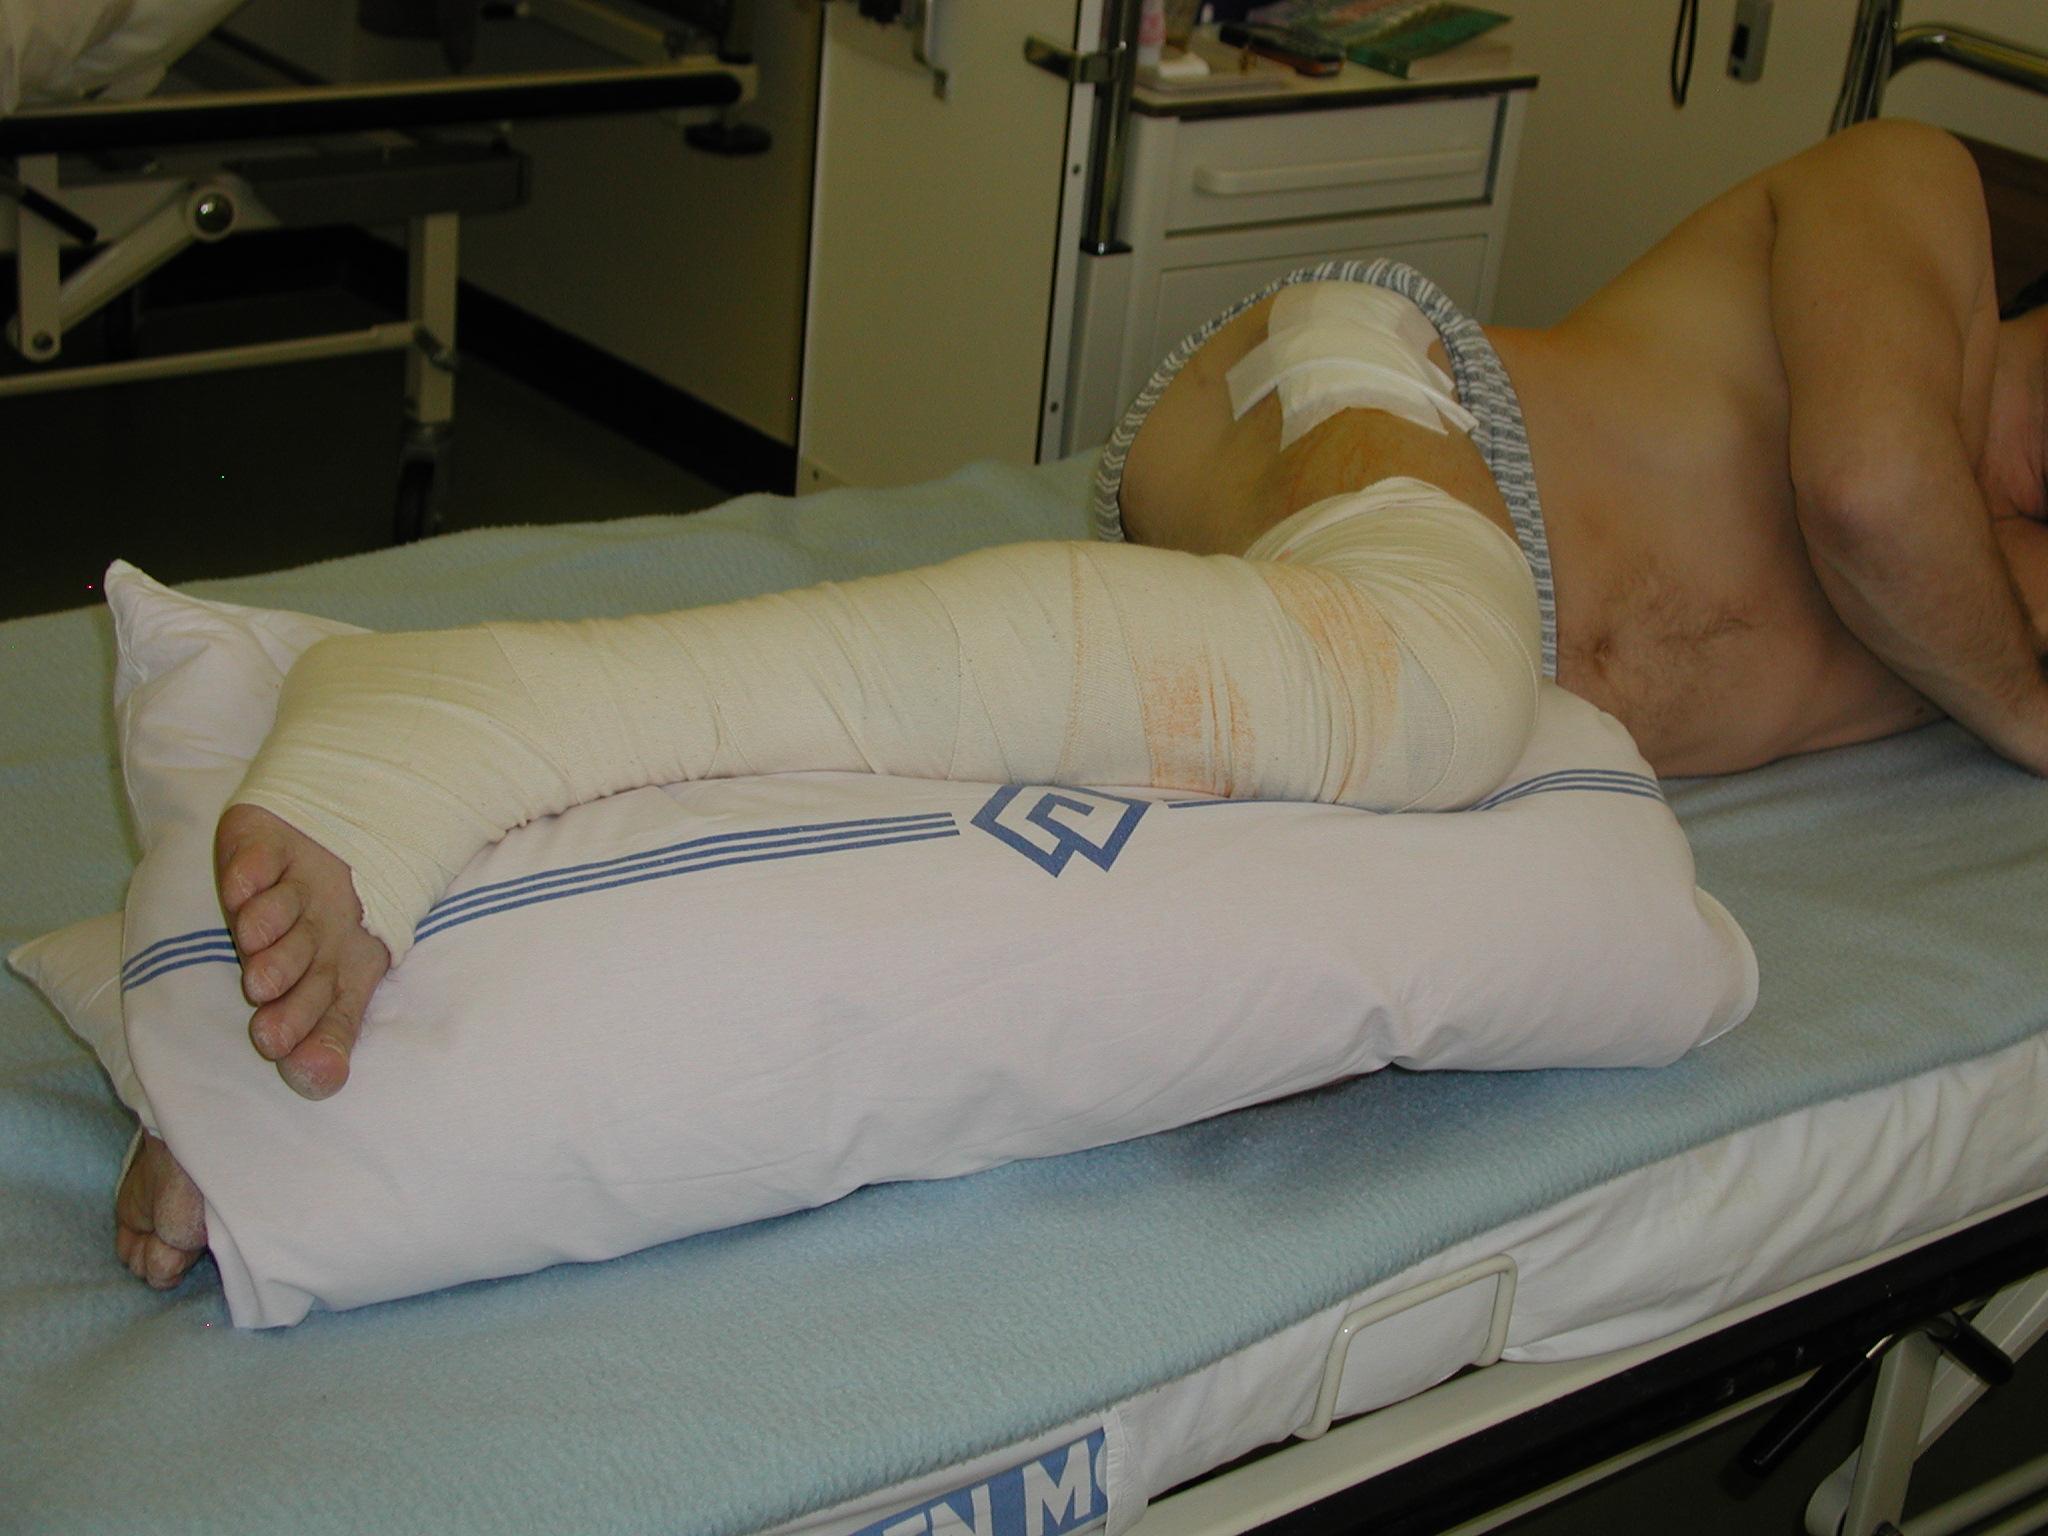 Poloha pacienta na boku s polštářem mezi dolními končetinami